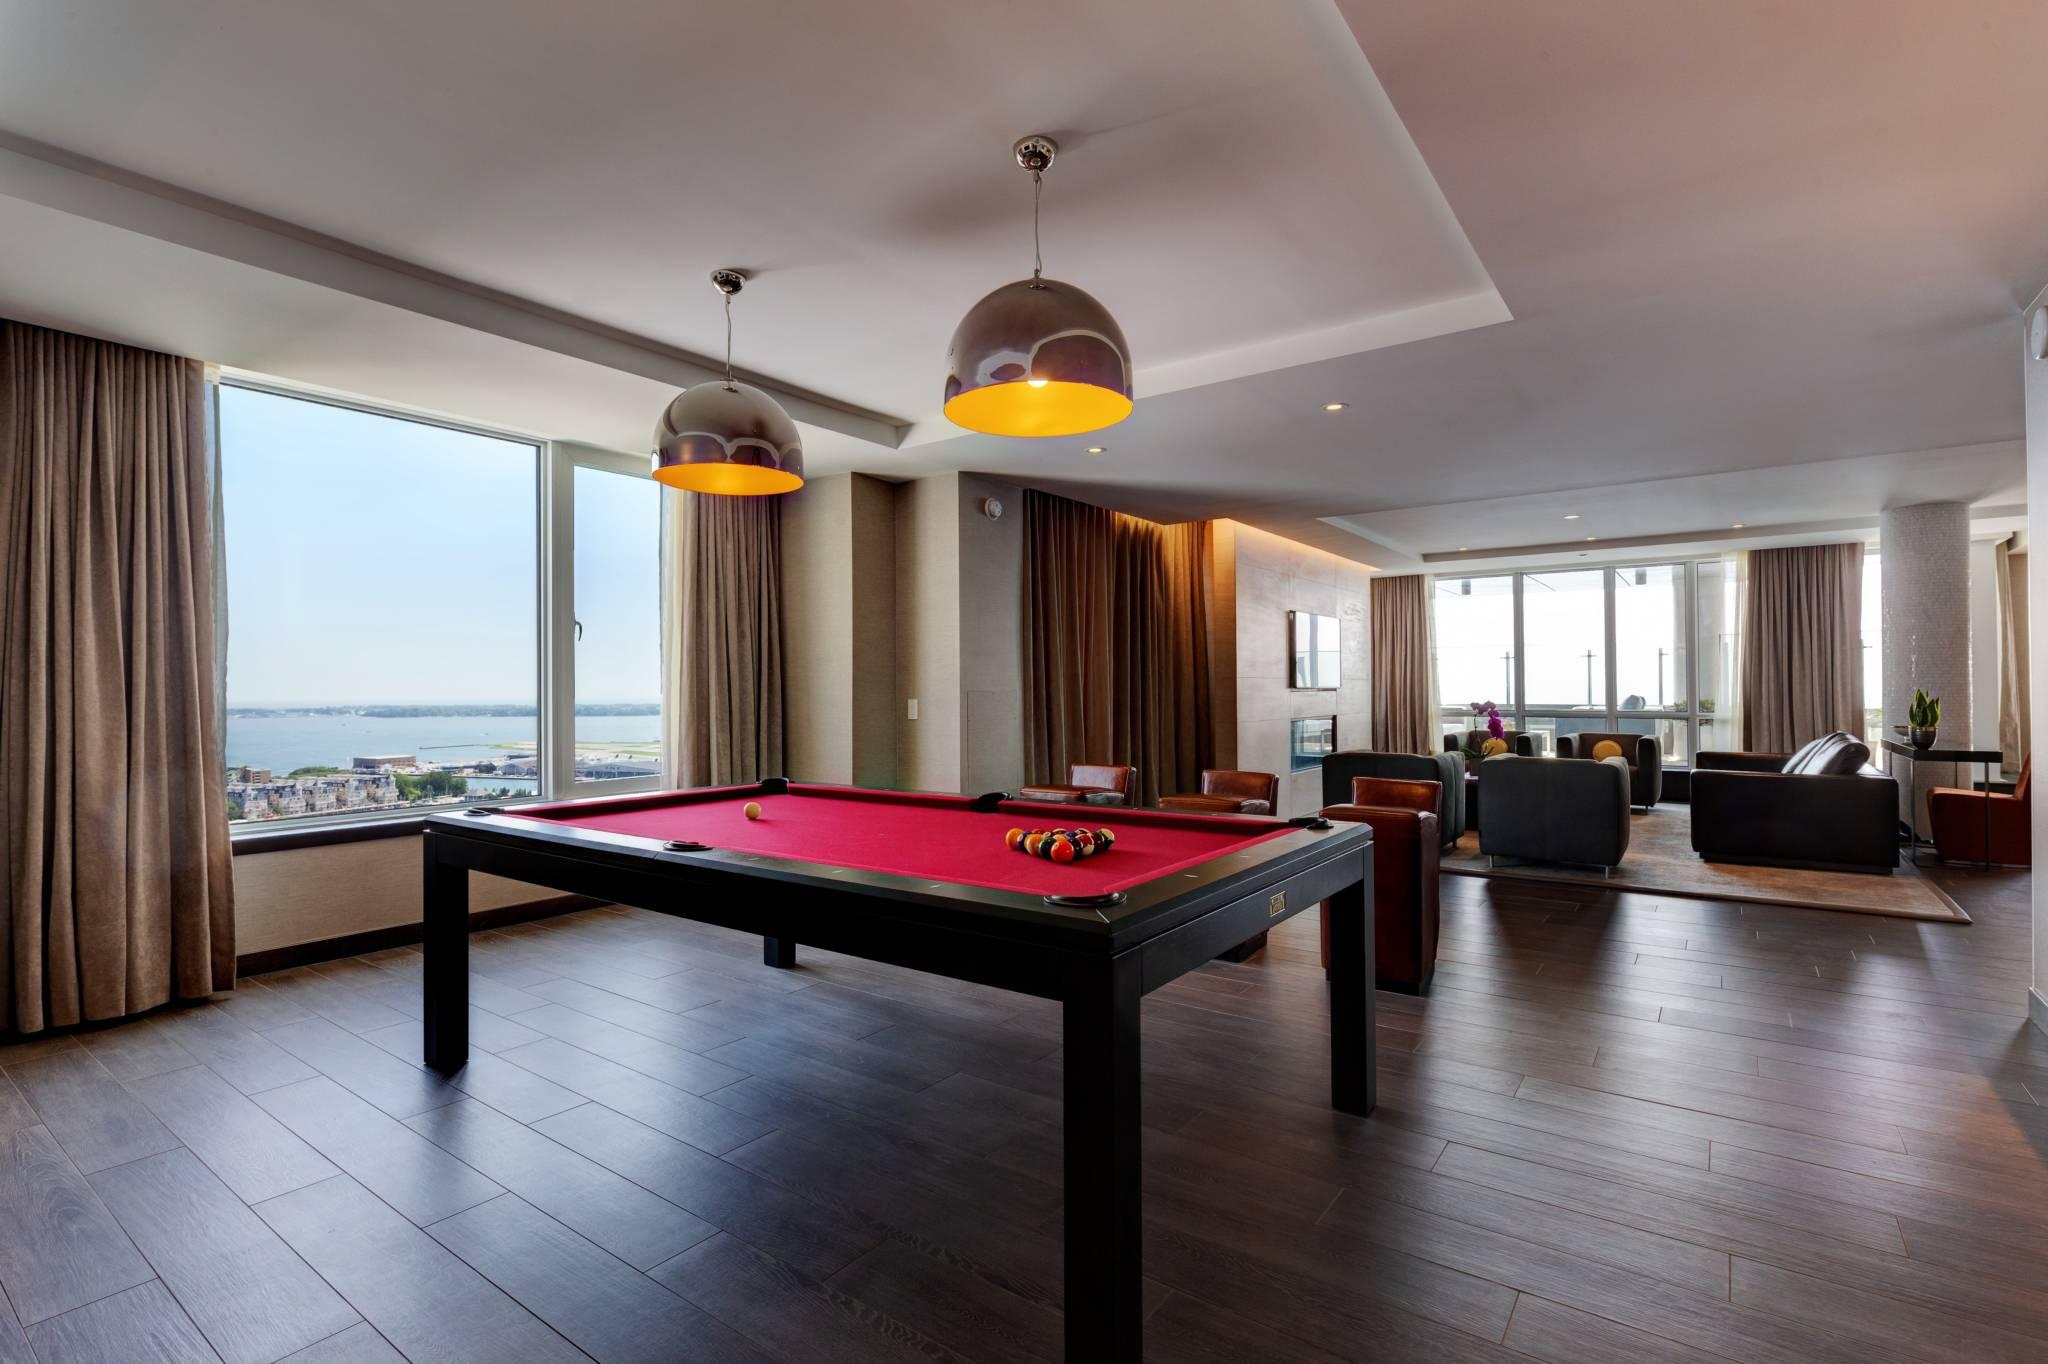 6000 a night toronto hotel x 2